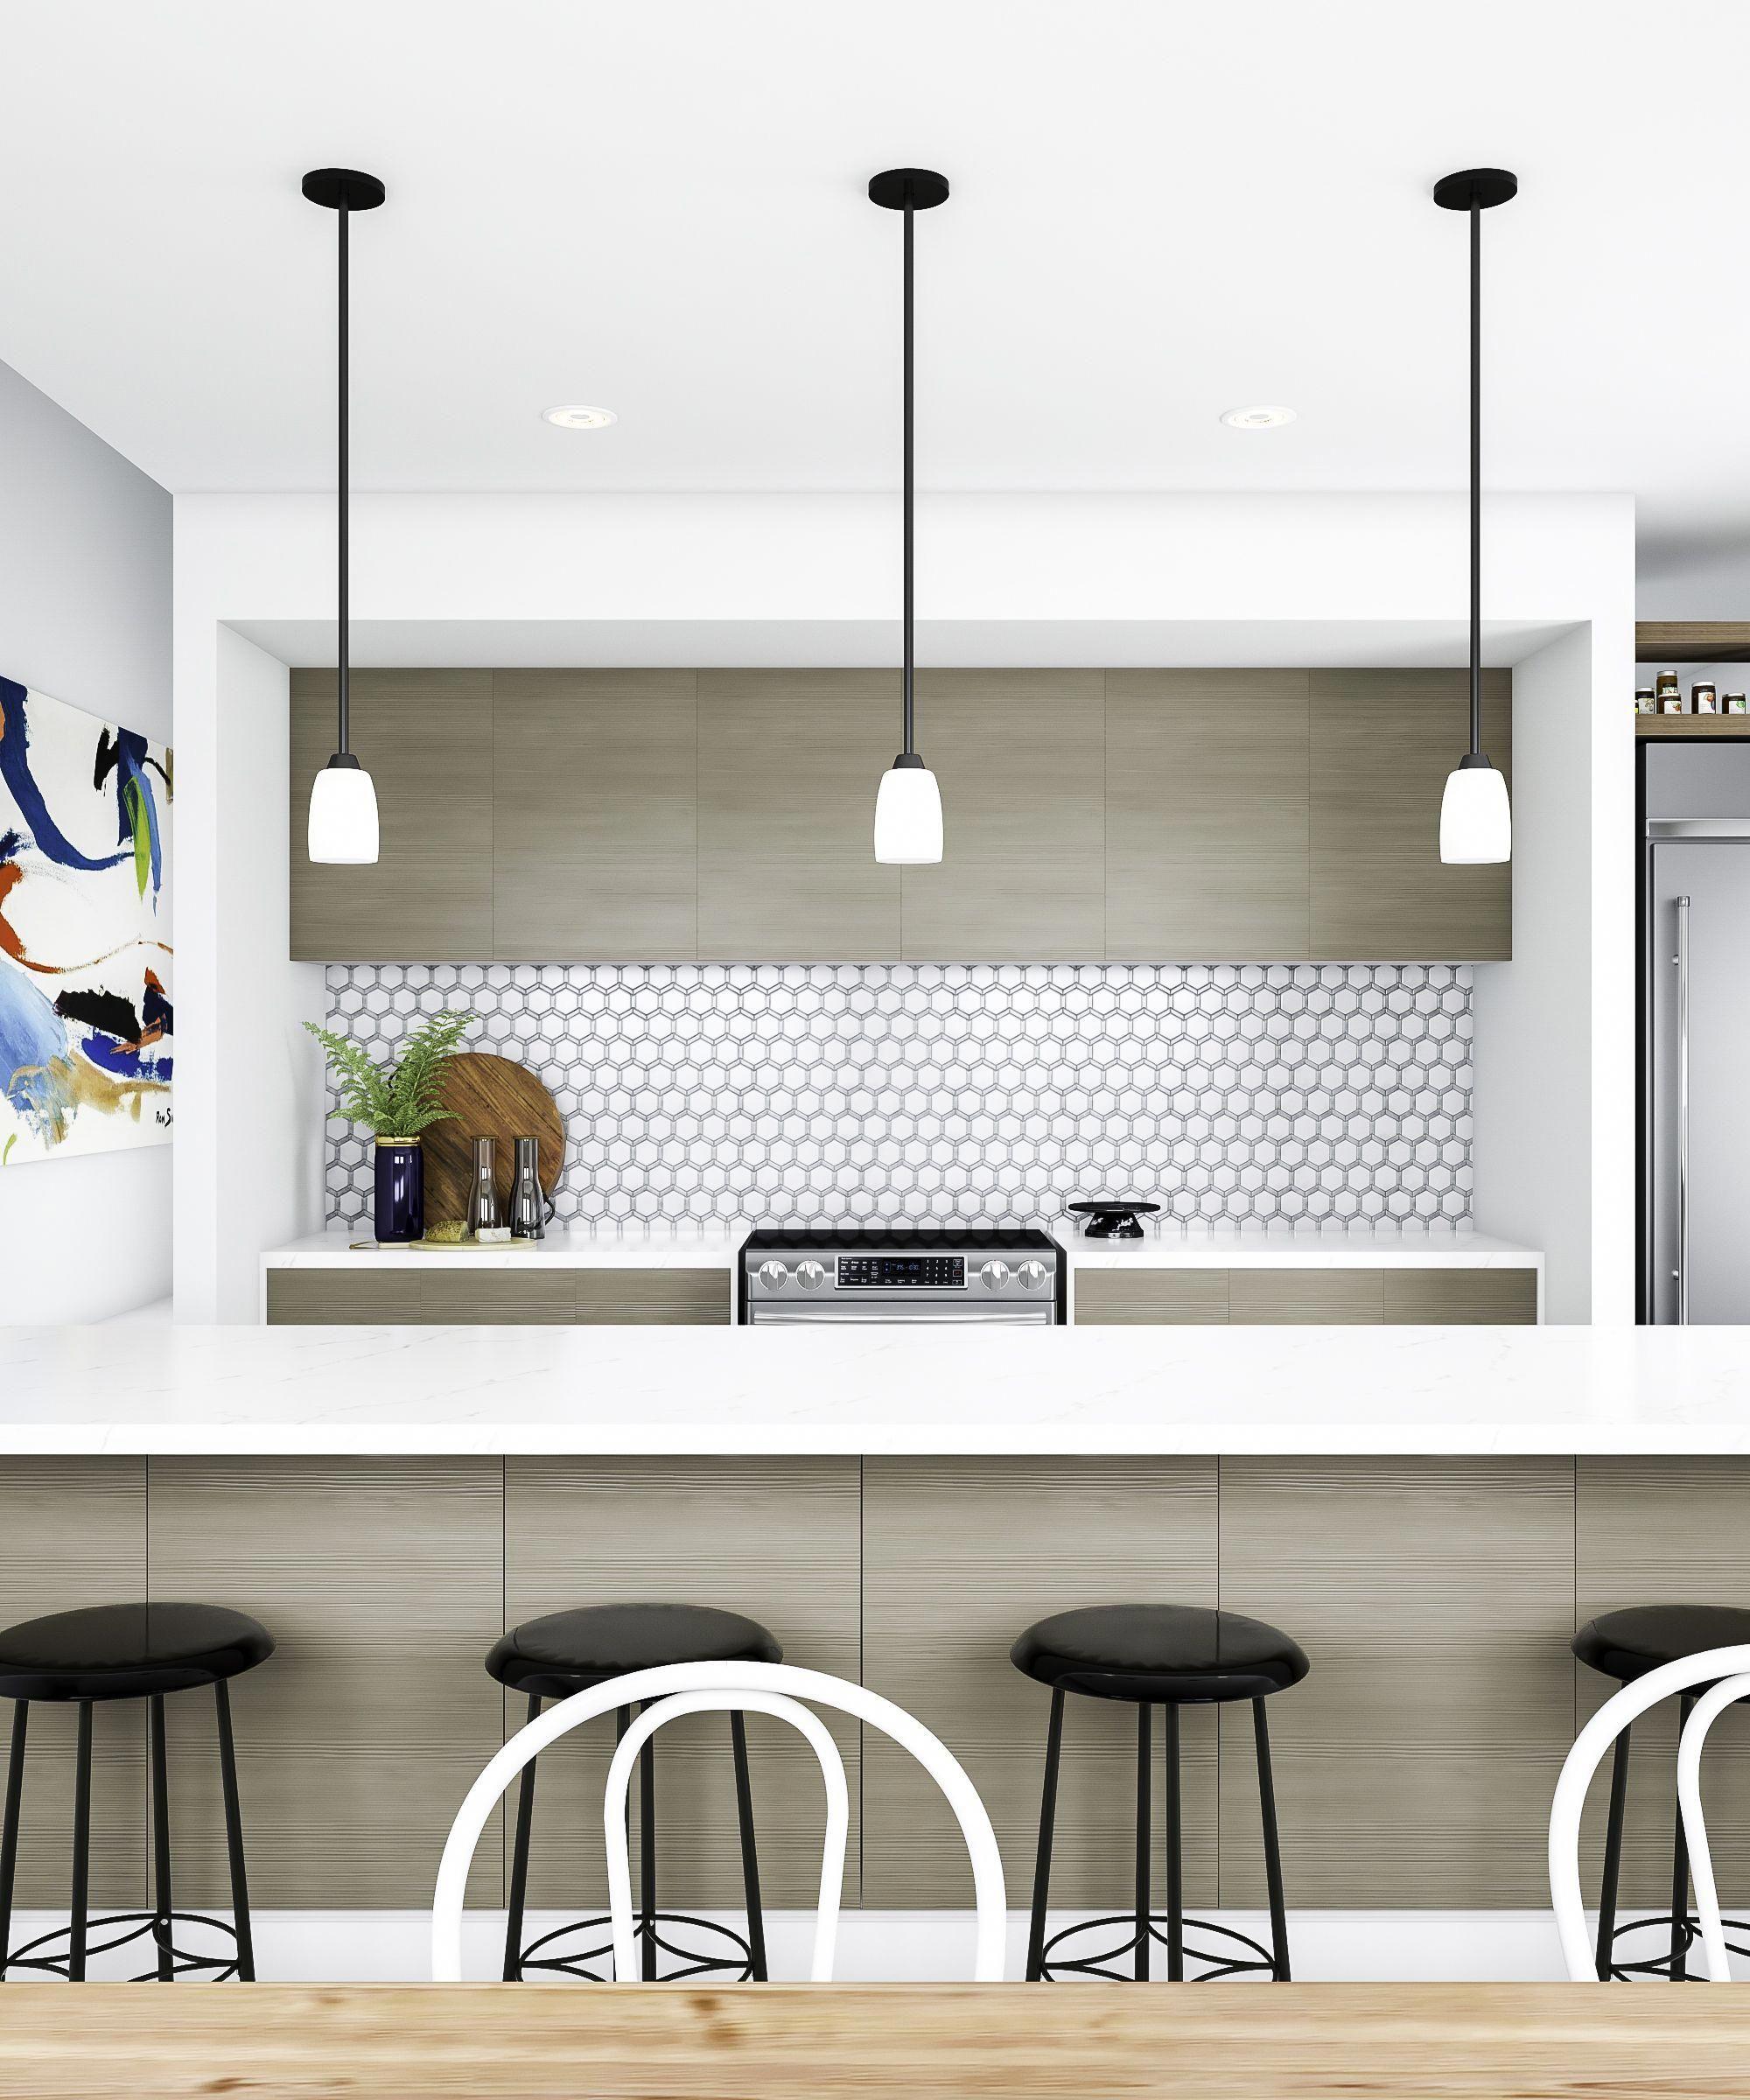 Modern Minimalist Kitchen Cabinets: Mosaic Makes A Comeback In A Modern, Minimalist Kitchen. A